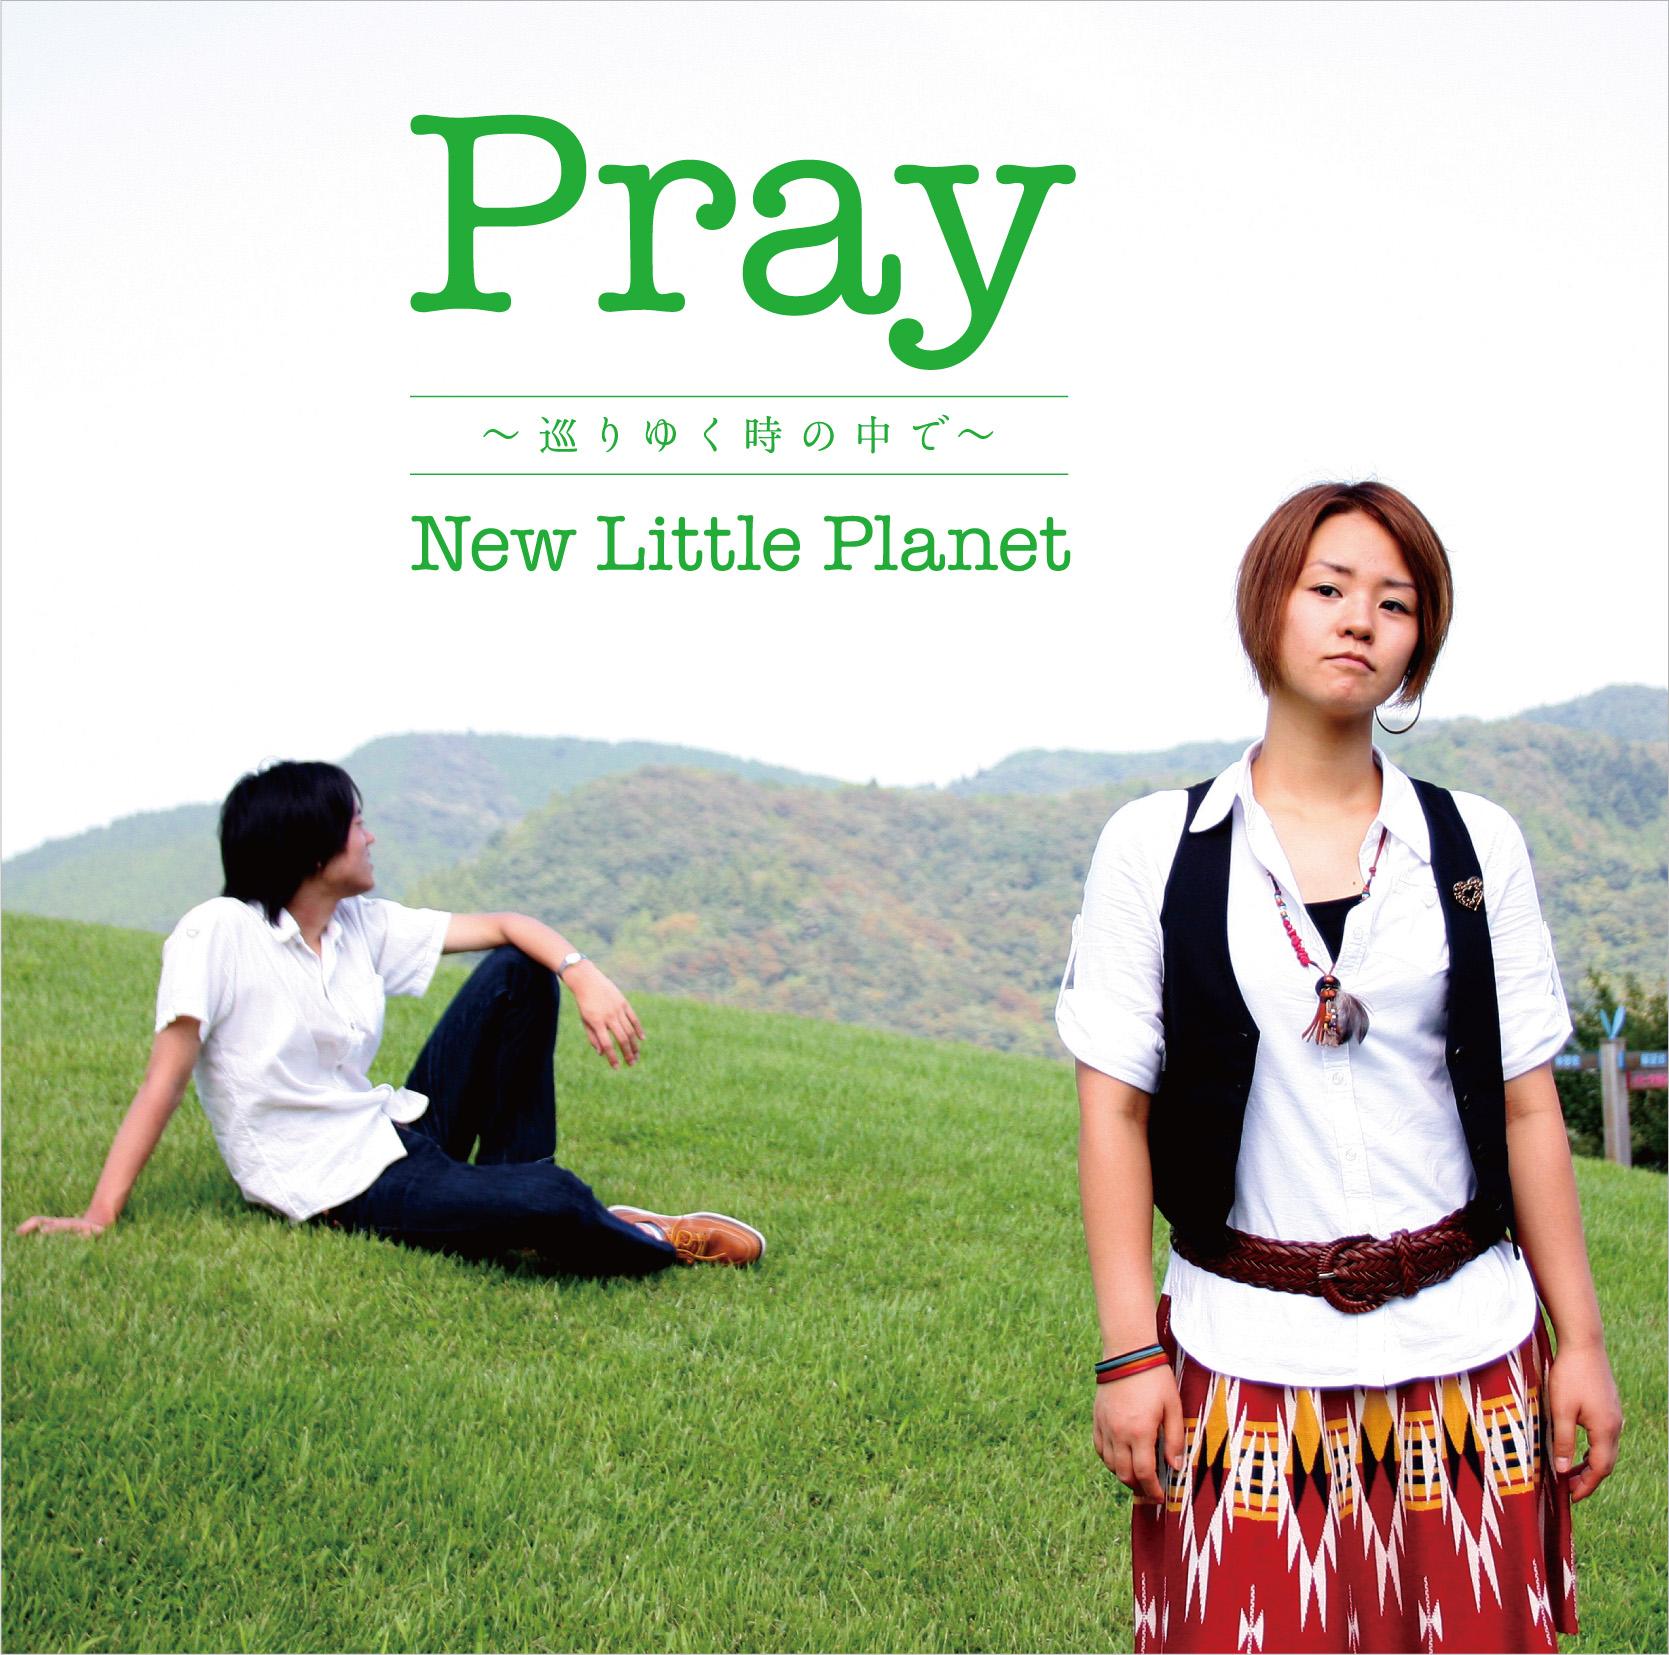 New Little Planet / Pray ~巡りゆく時の中で~